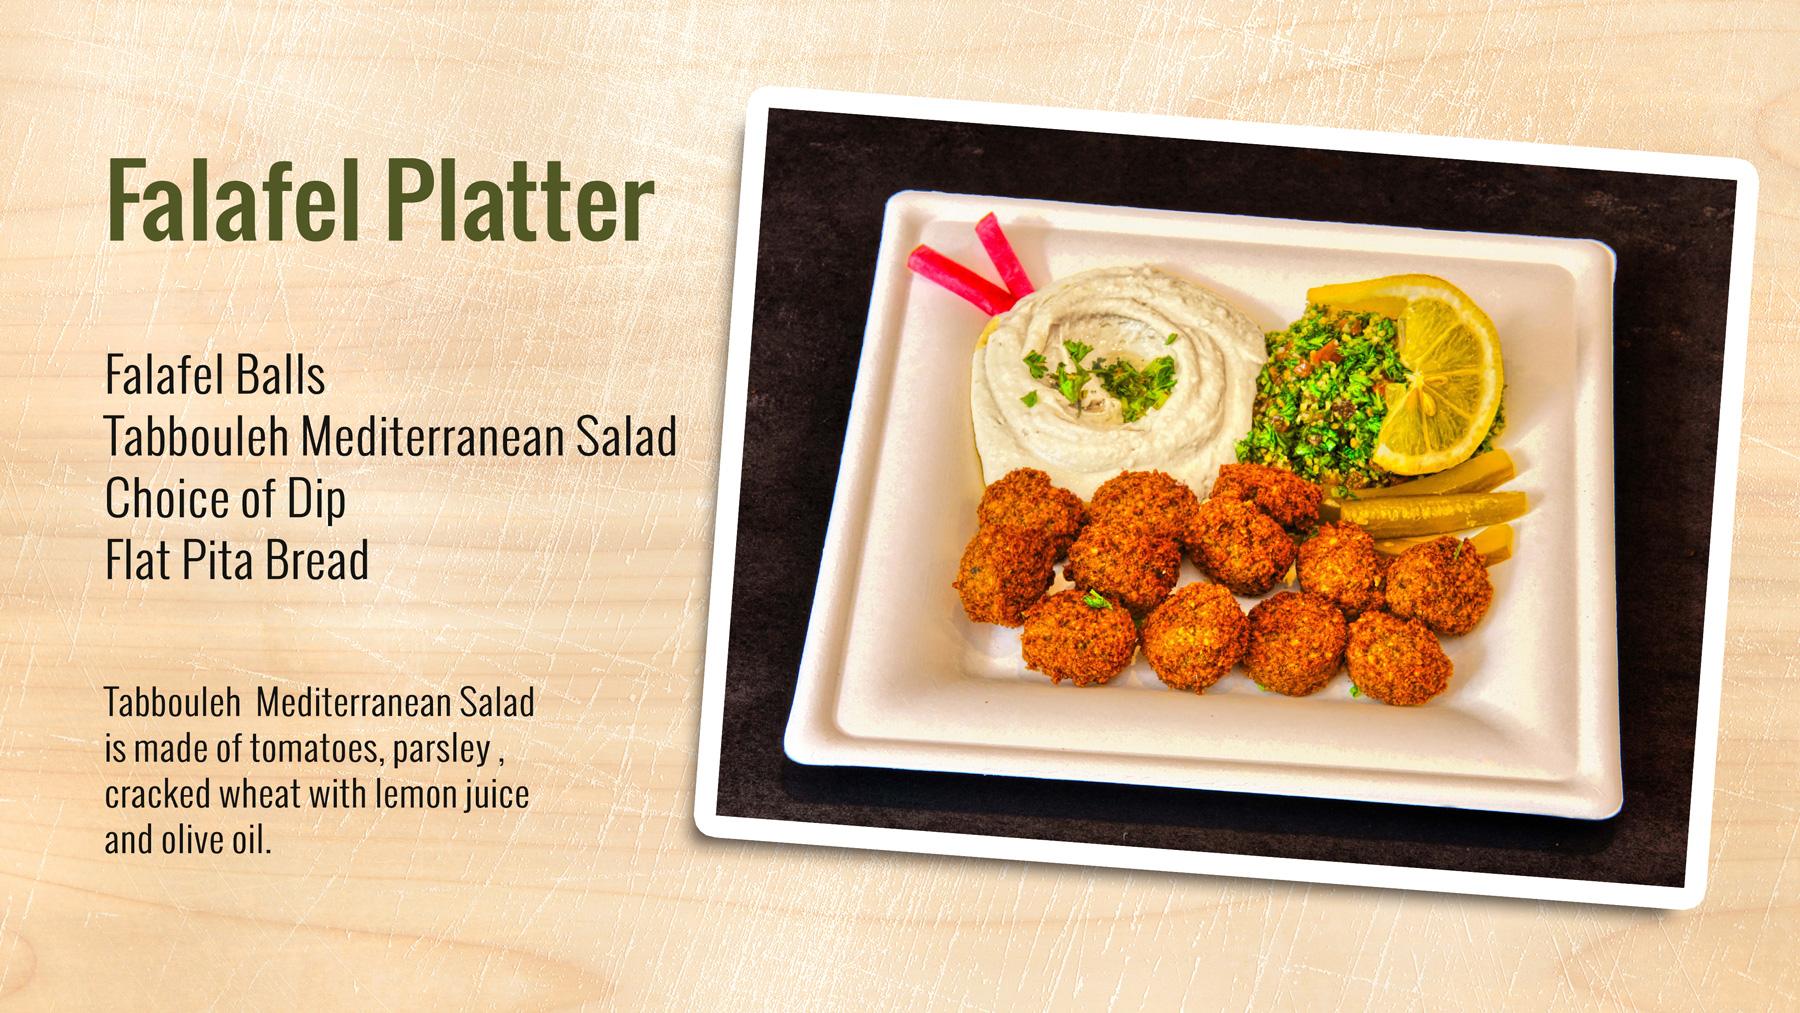 Falafel_platter_screen2web.jpg